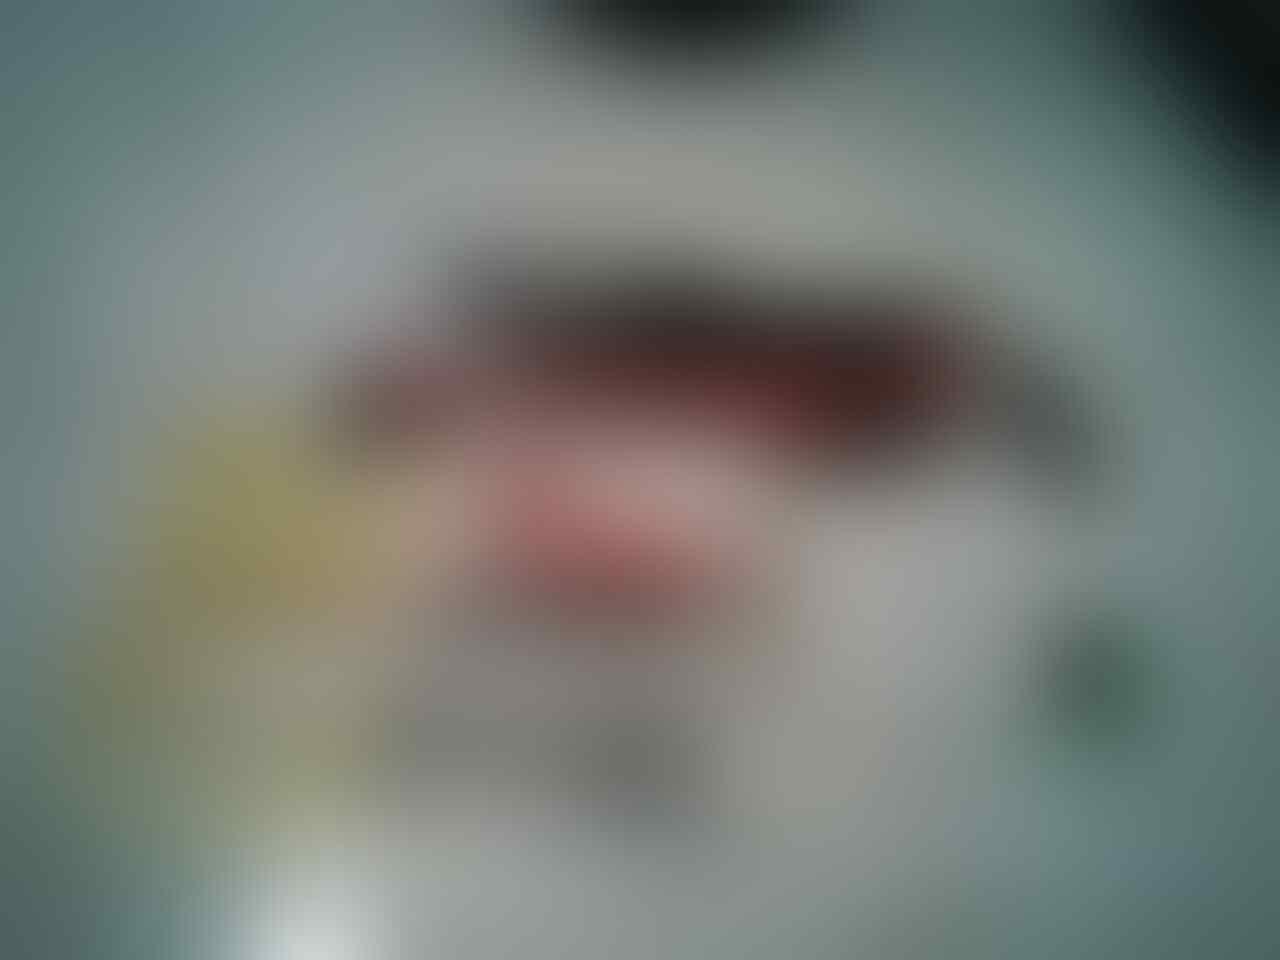 Terjual Xenia Xi Plus Deluxe 2010 Vvti Tgn Pertama Istimewa Kaskus Kotak P3k Mobil